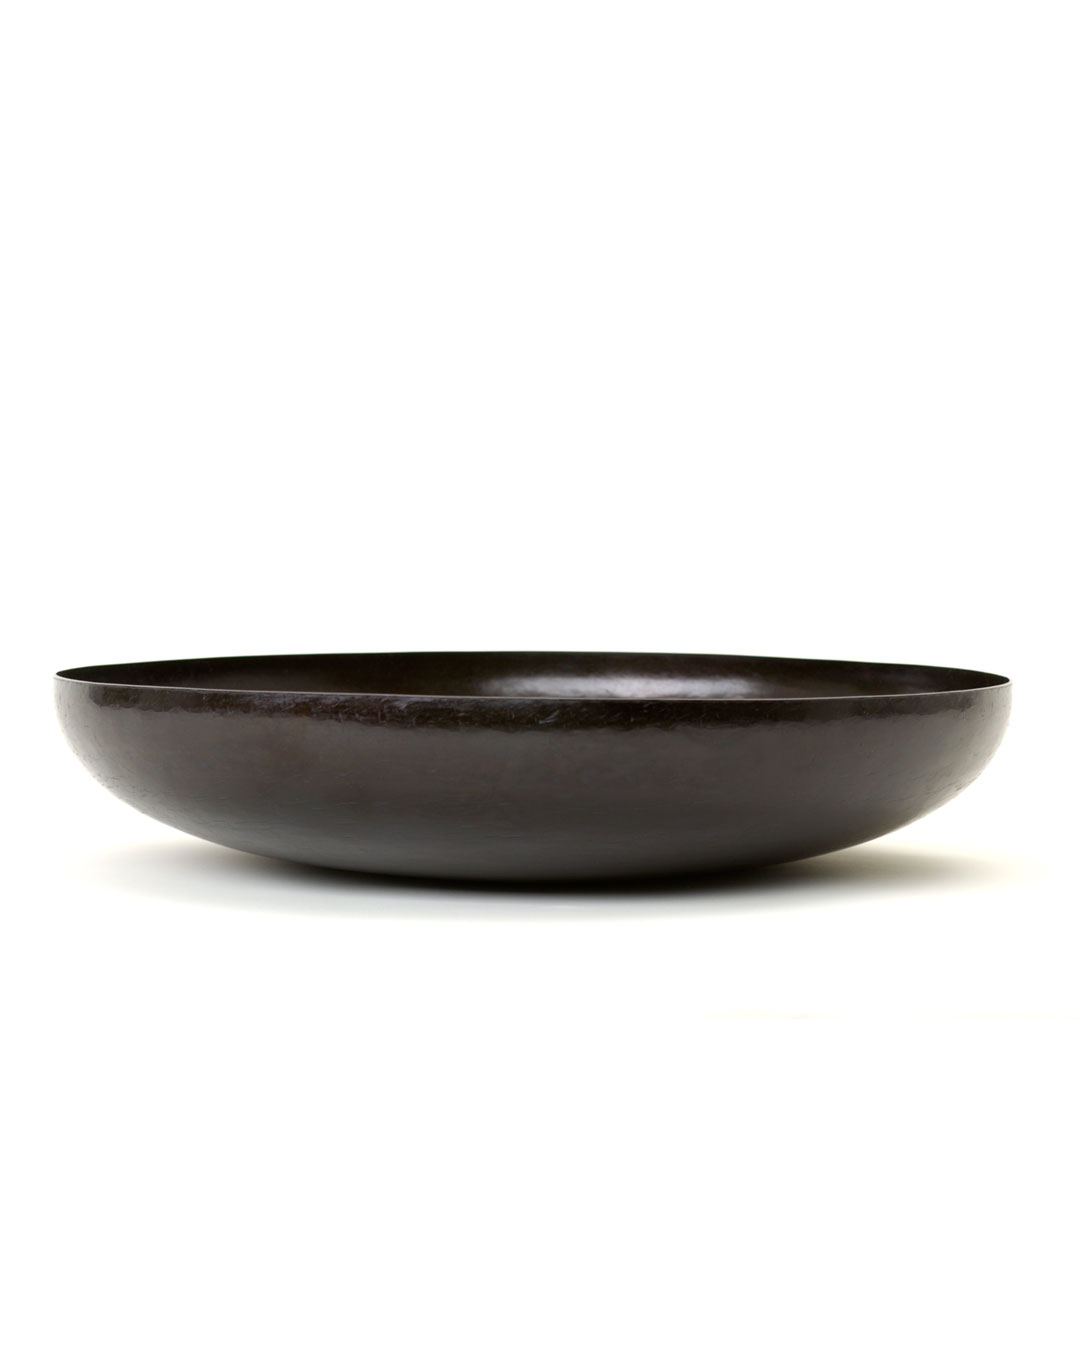 Tore Svensson, untitled, 2006, bowl; iron, 80 x ø 350 mm, €3500